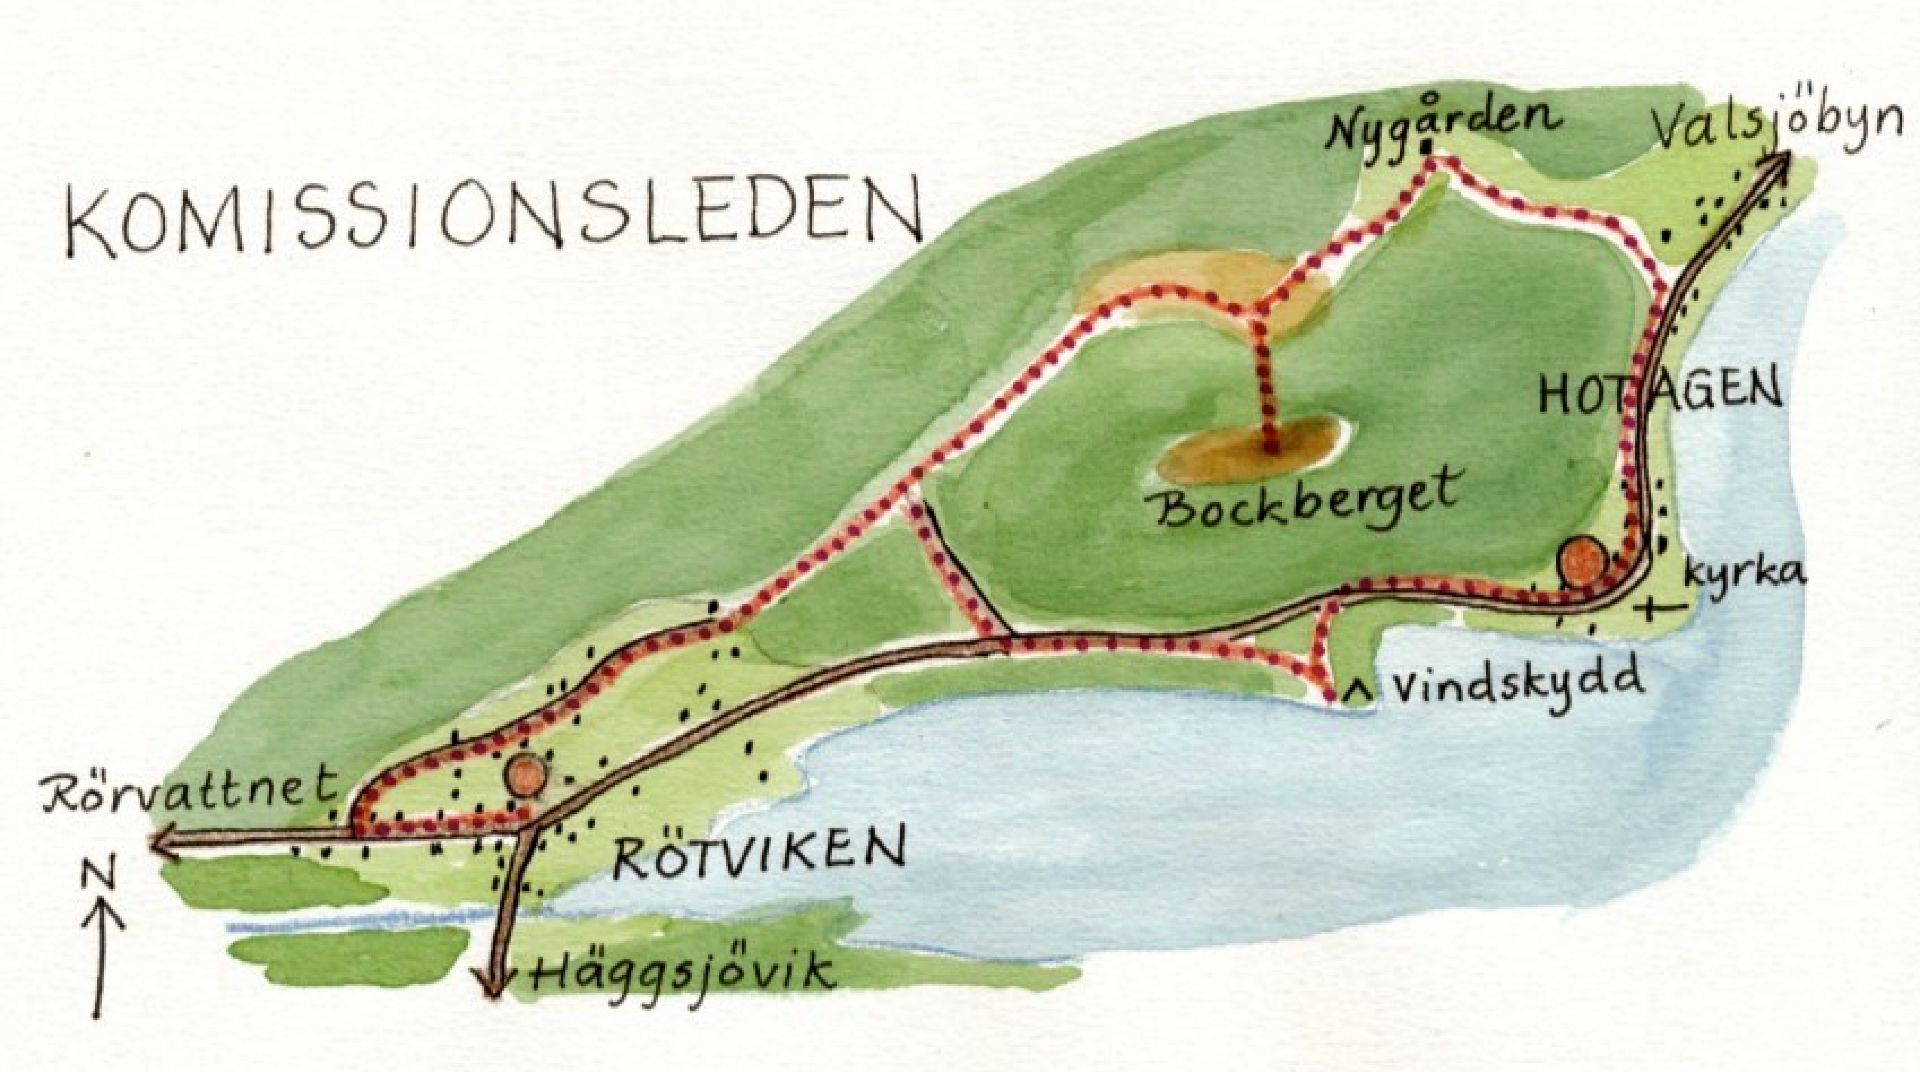 Kommissionsleden ledkarta. Illustration Rut Magnusson.